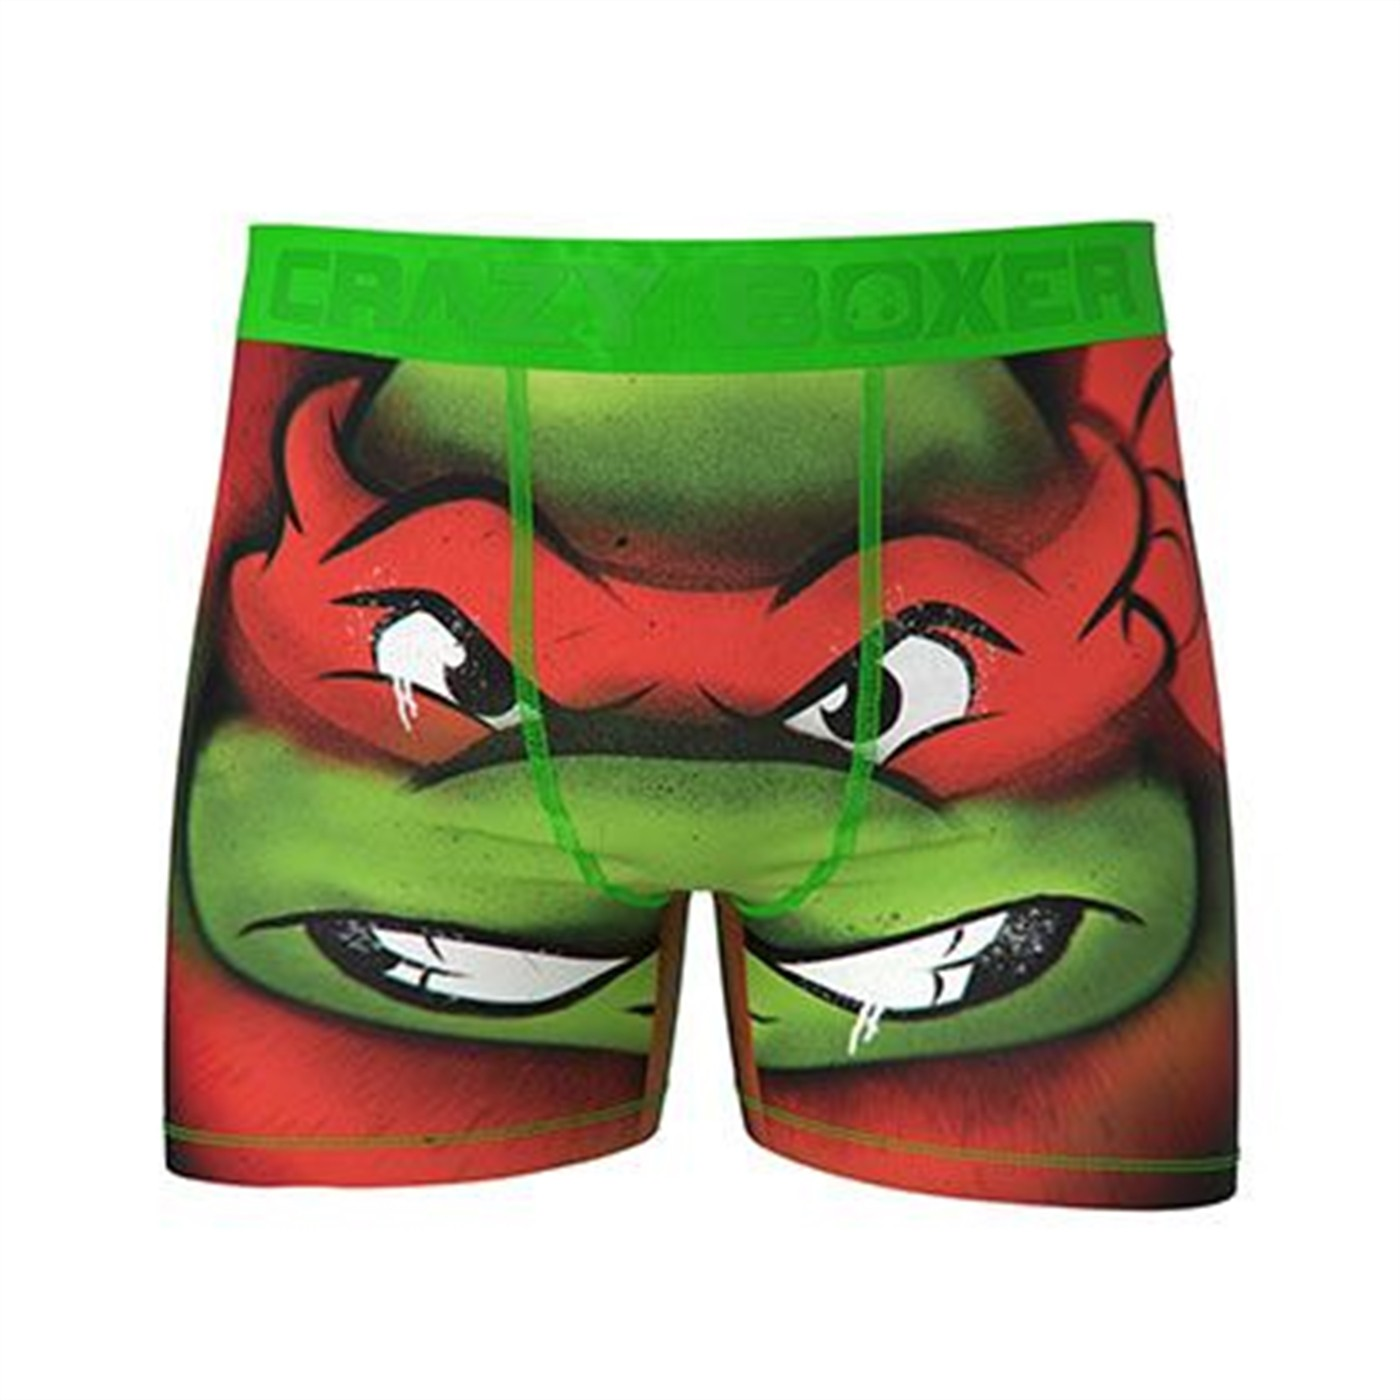 Teenage Mutant Ninja Turtles' Raphael Men's Underwear Boxer Briefs